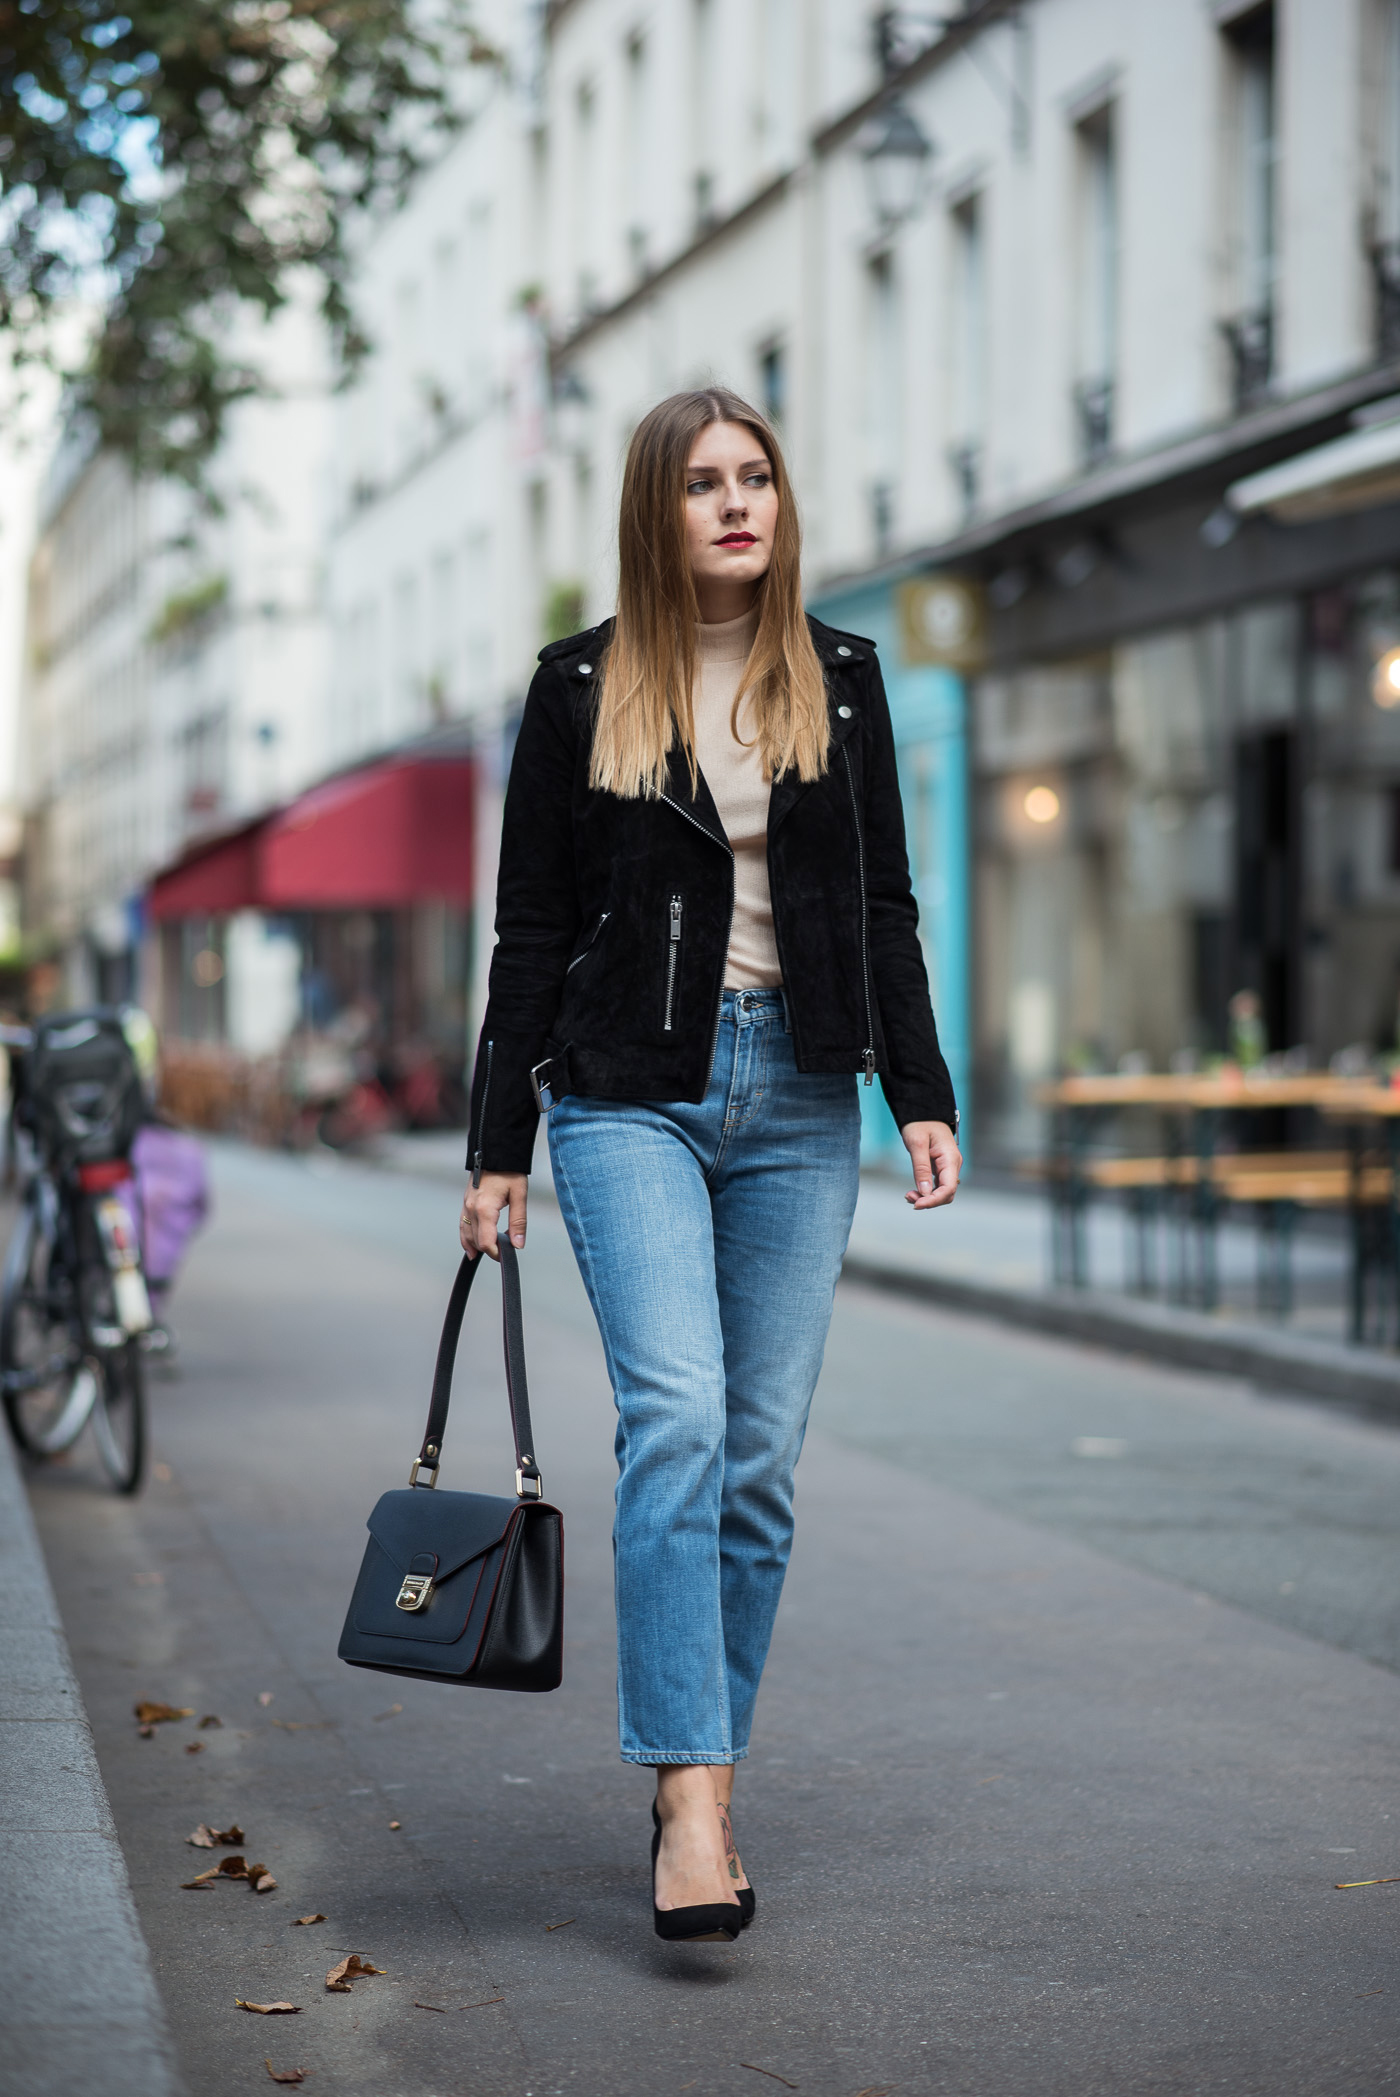 paris_fashion_week_leather_jacket_selected_femme_5